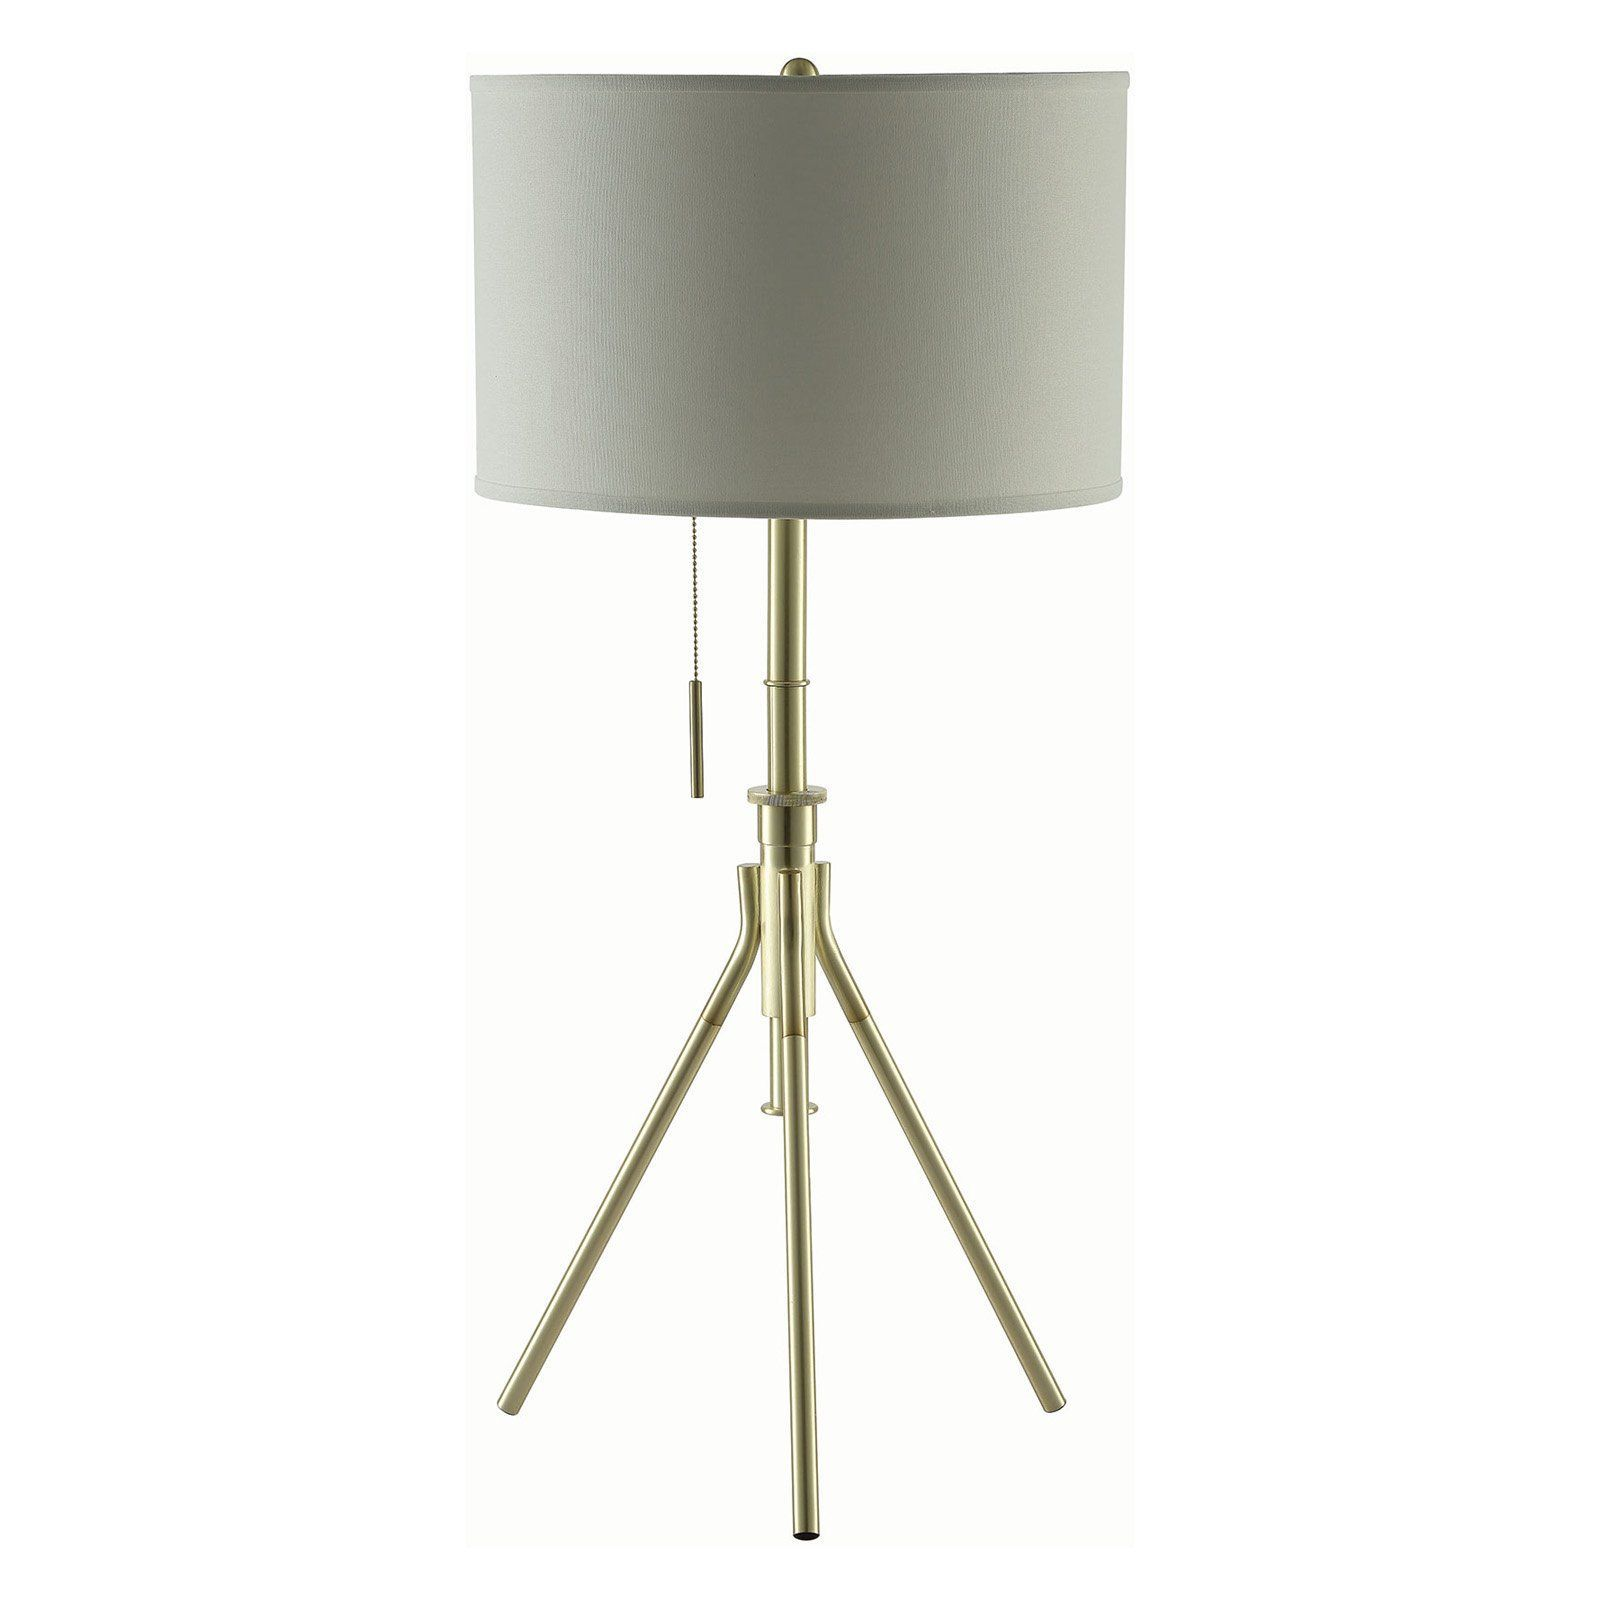 Coaster Company Of America 902970 Table Lamp